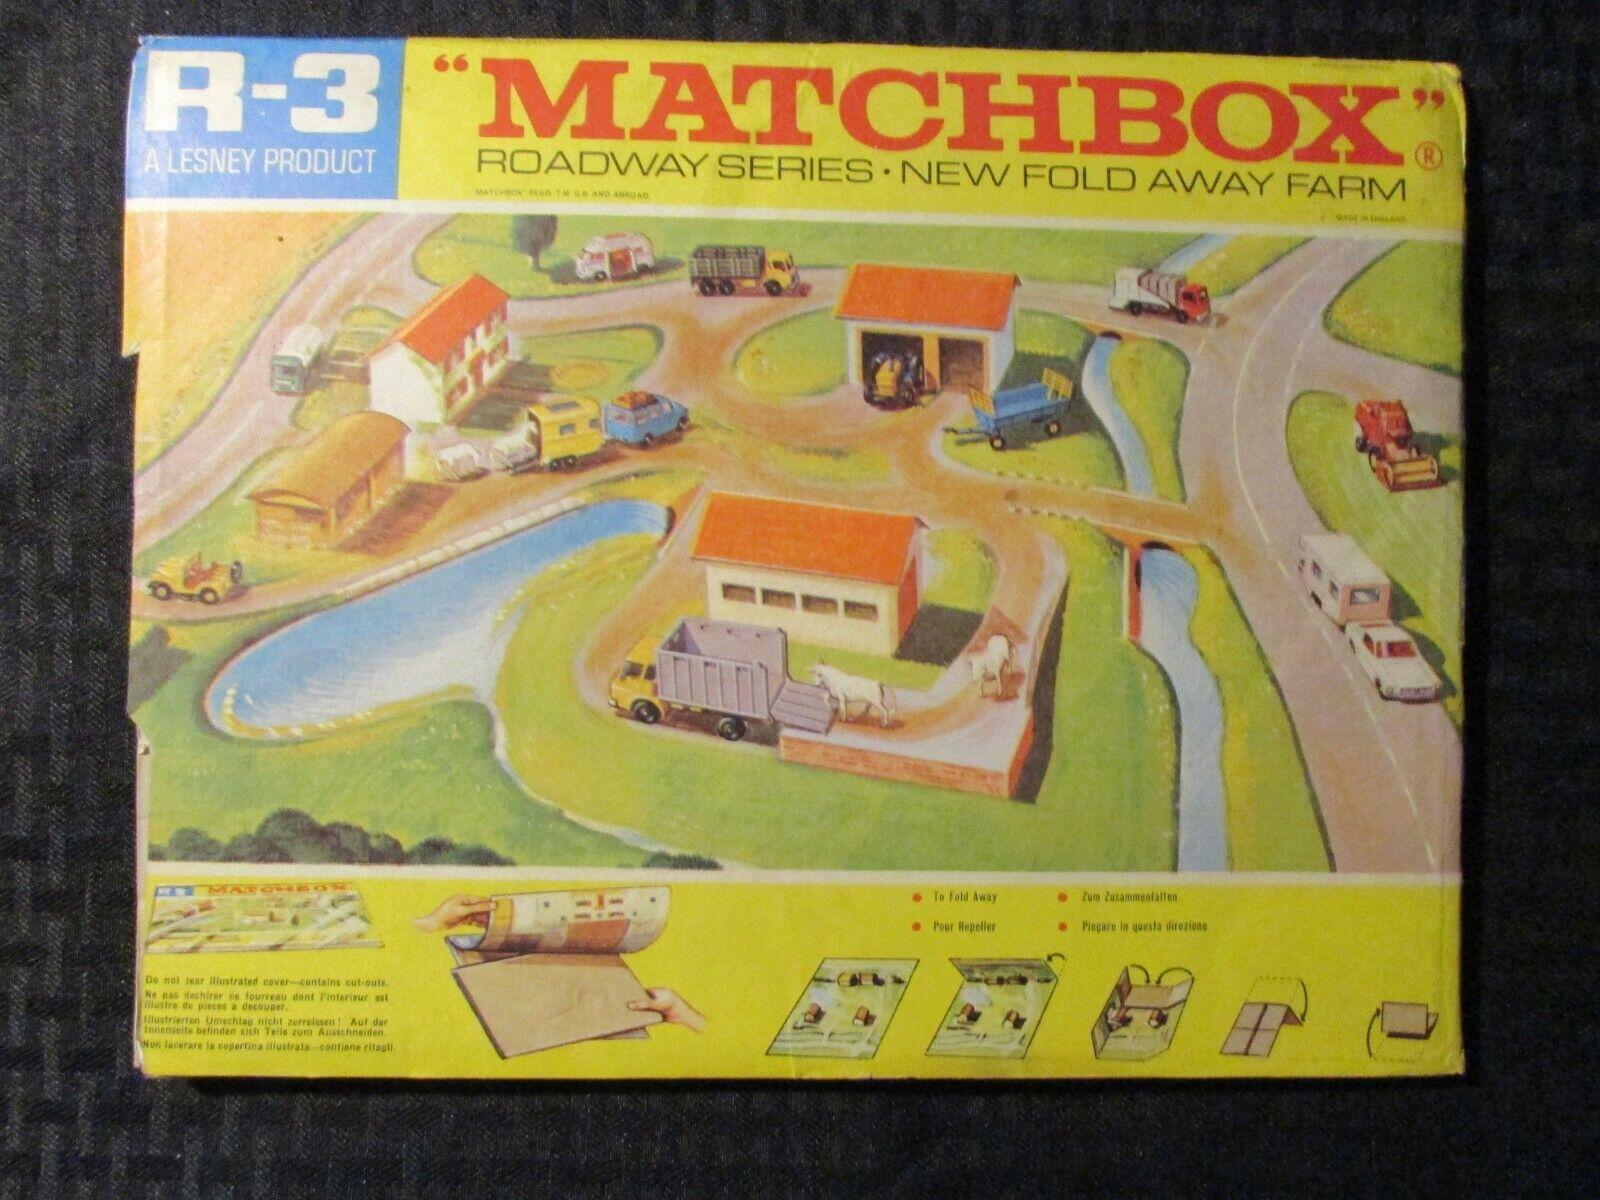 Vintage MATCHBOX Roadway Series R-3 New Fold Away Farm FN- FN+ Lesney England